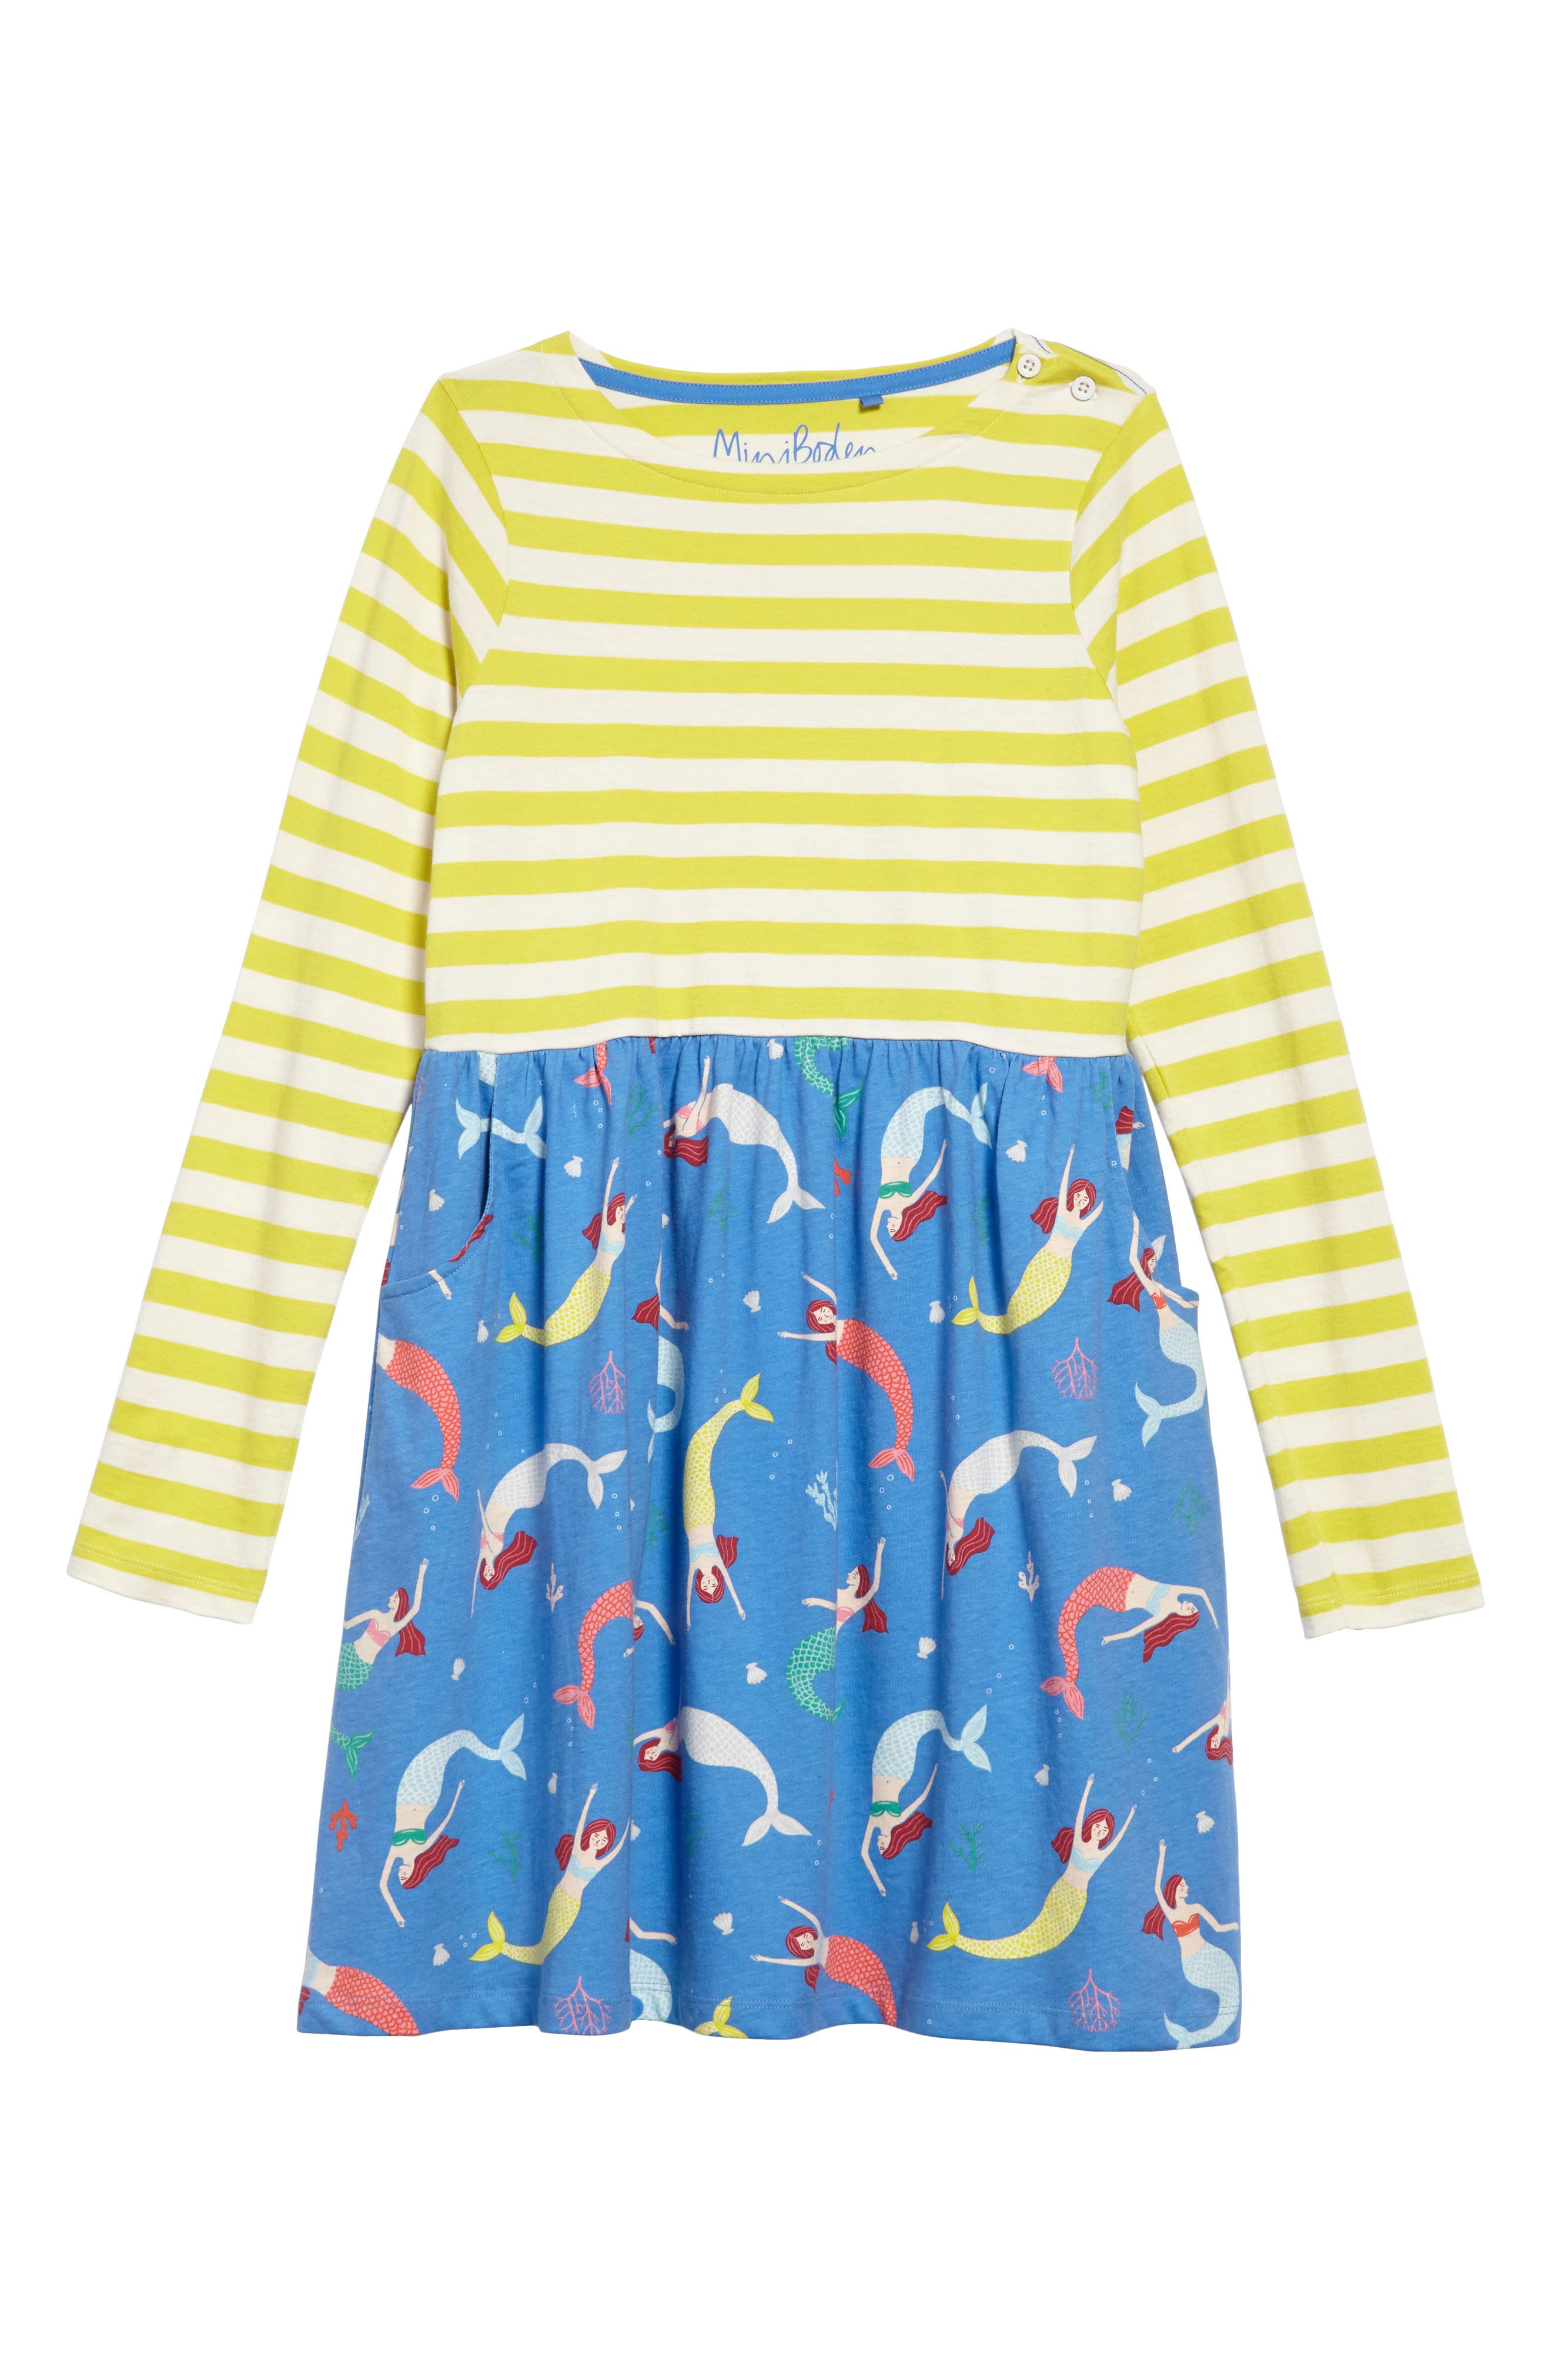 Hotchpotch Jersey Dress,                         Main,                         color, Penzance Blue Mermaid